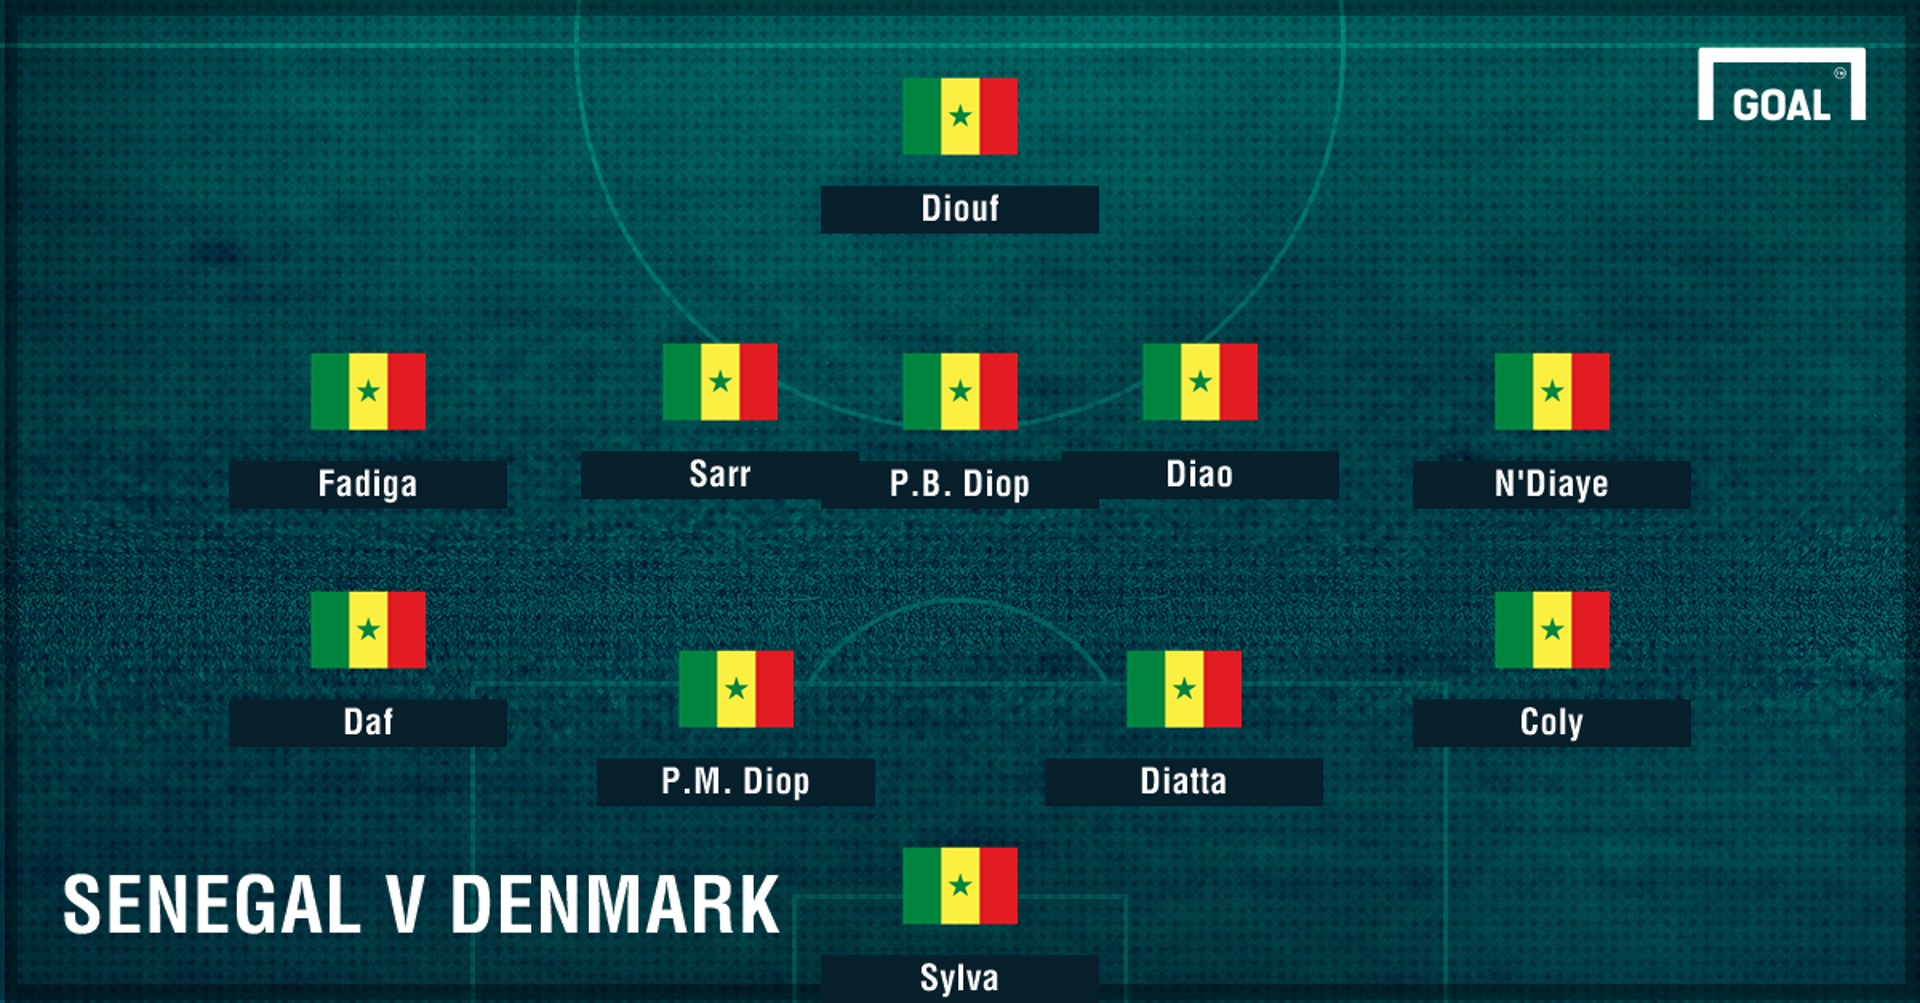 Senegal XI vs Denmark 2002